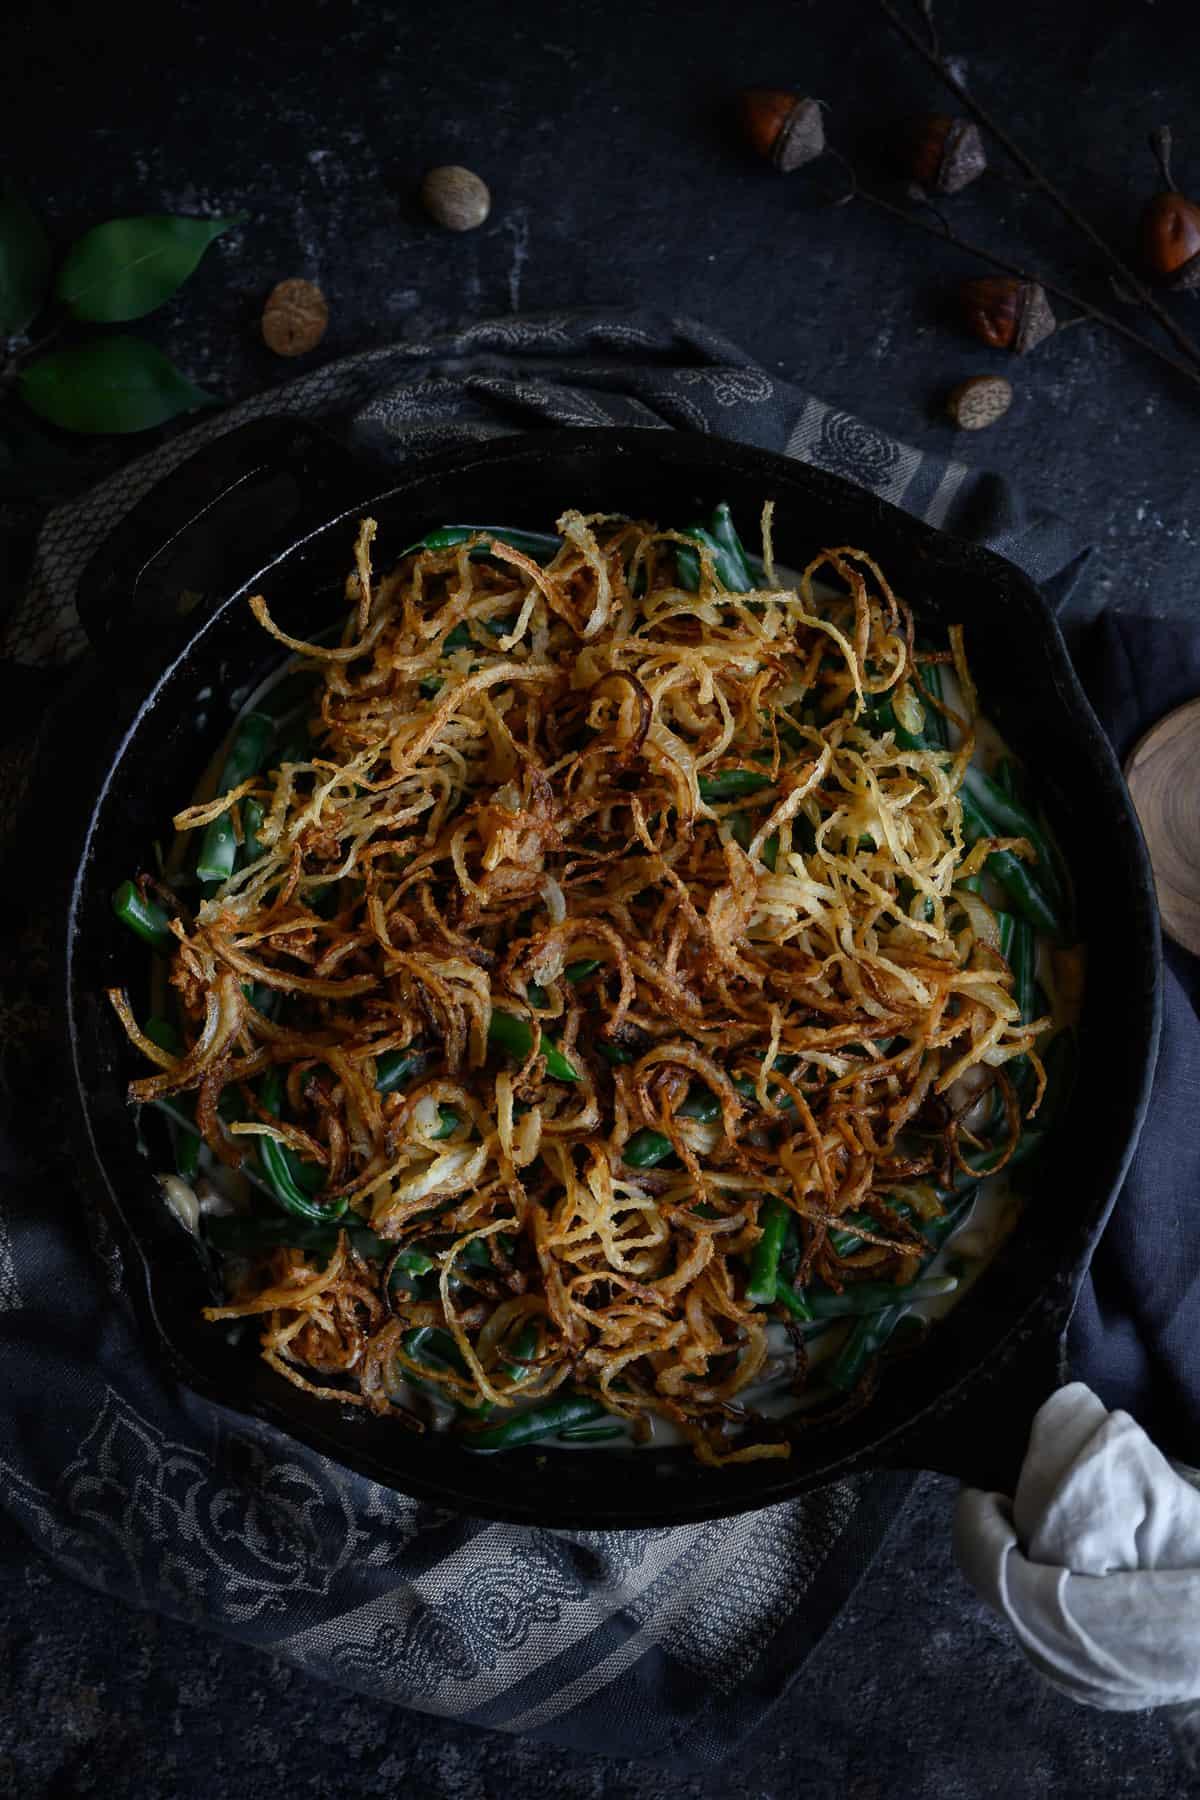 fresh green bean casserole in a cast iron skillet